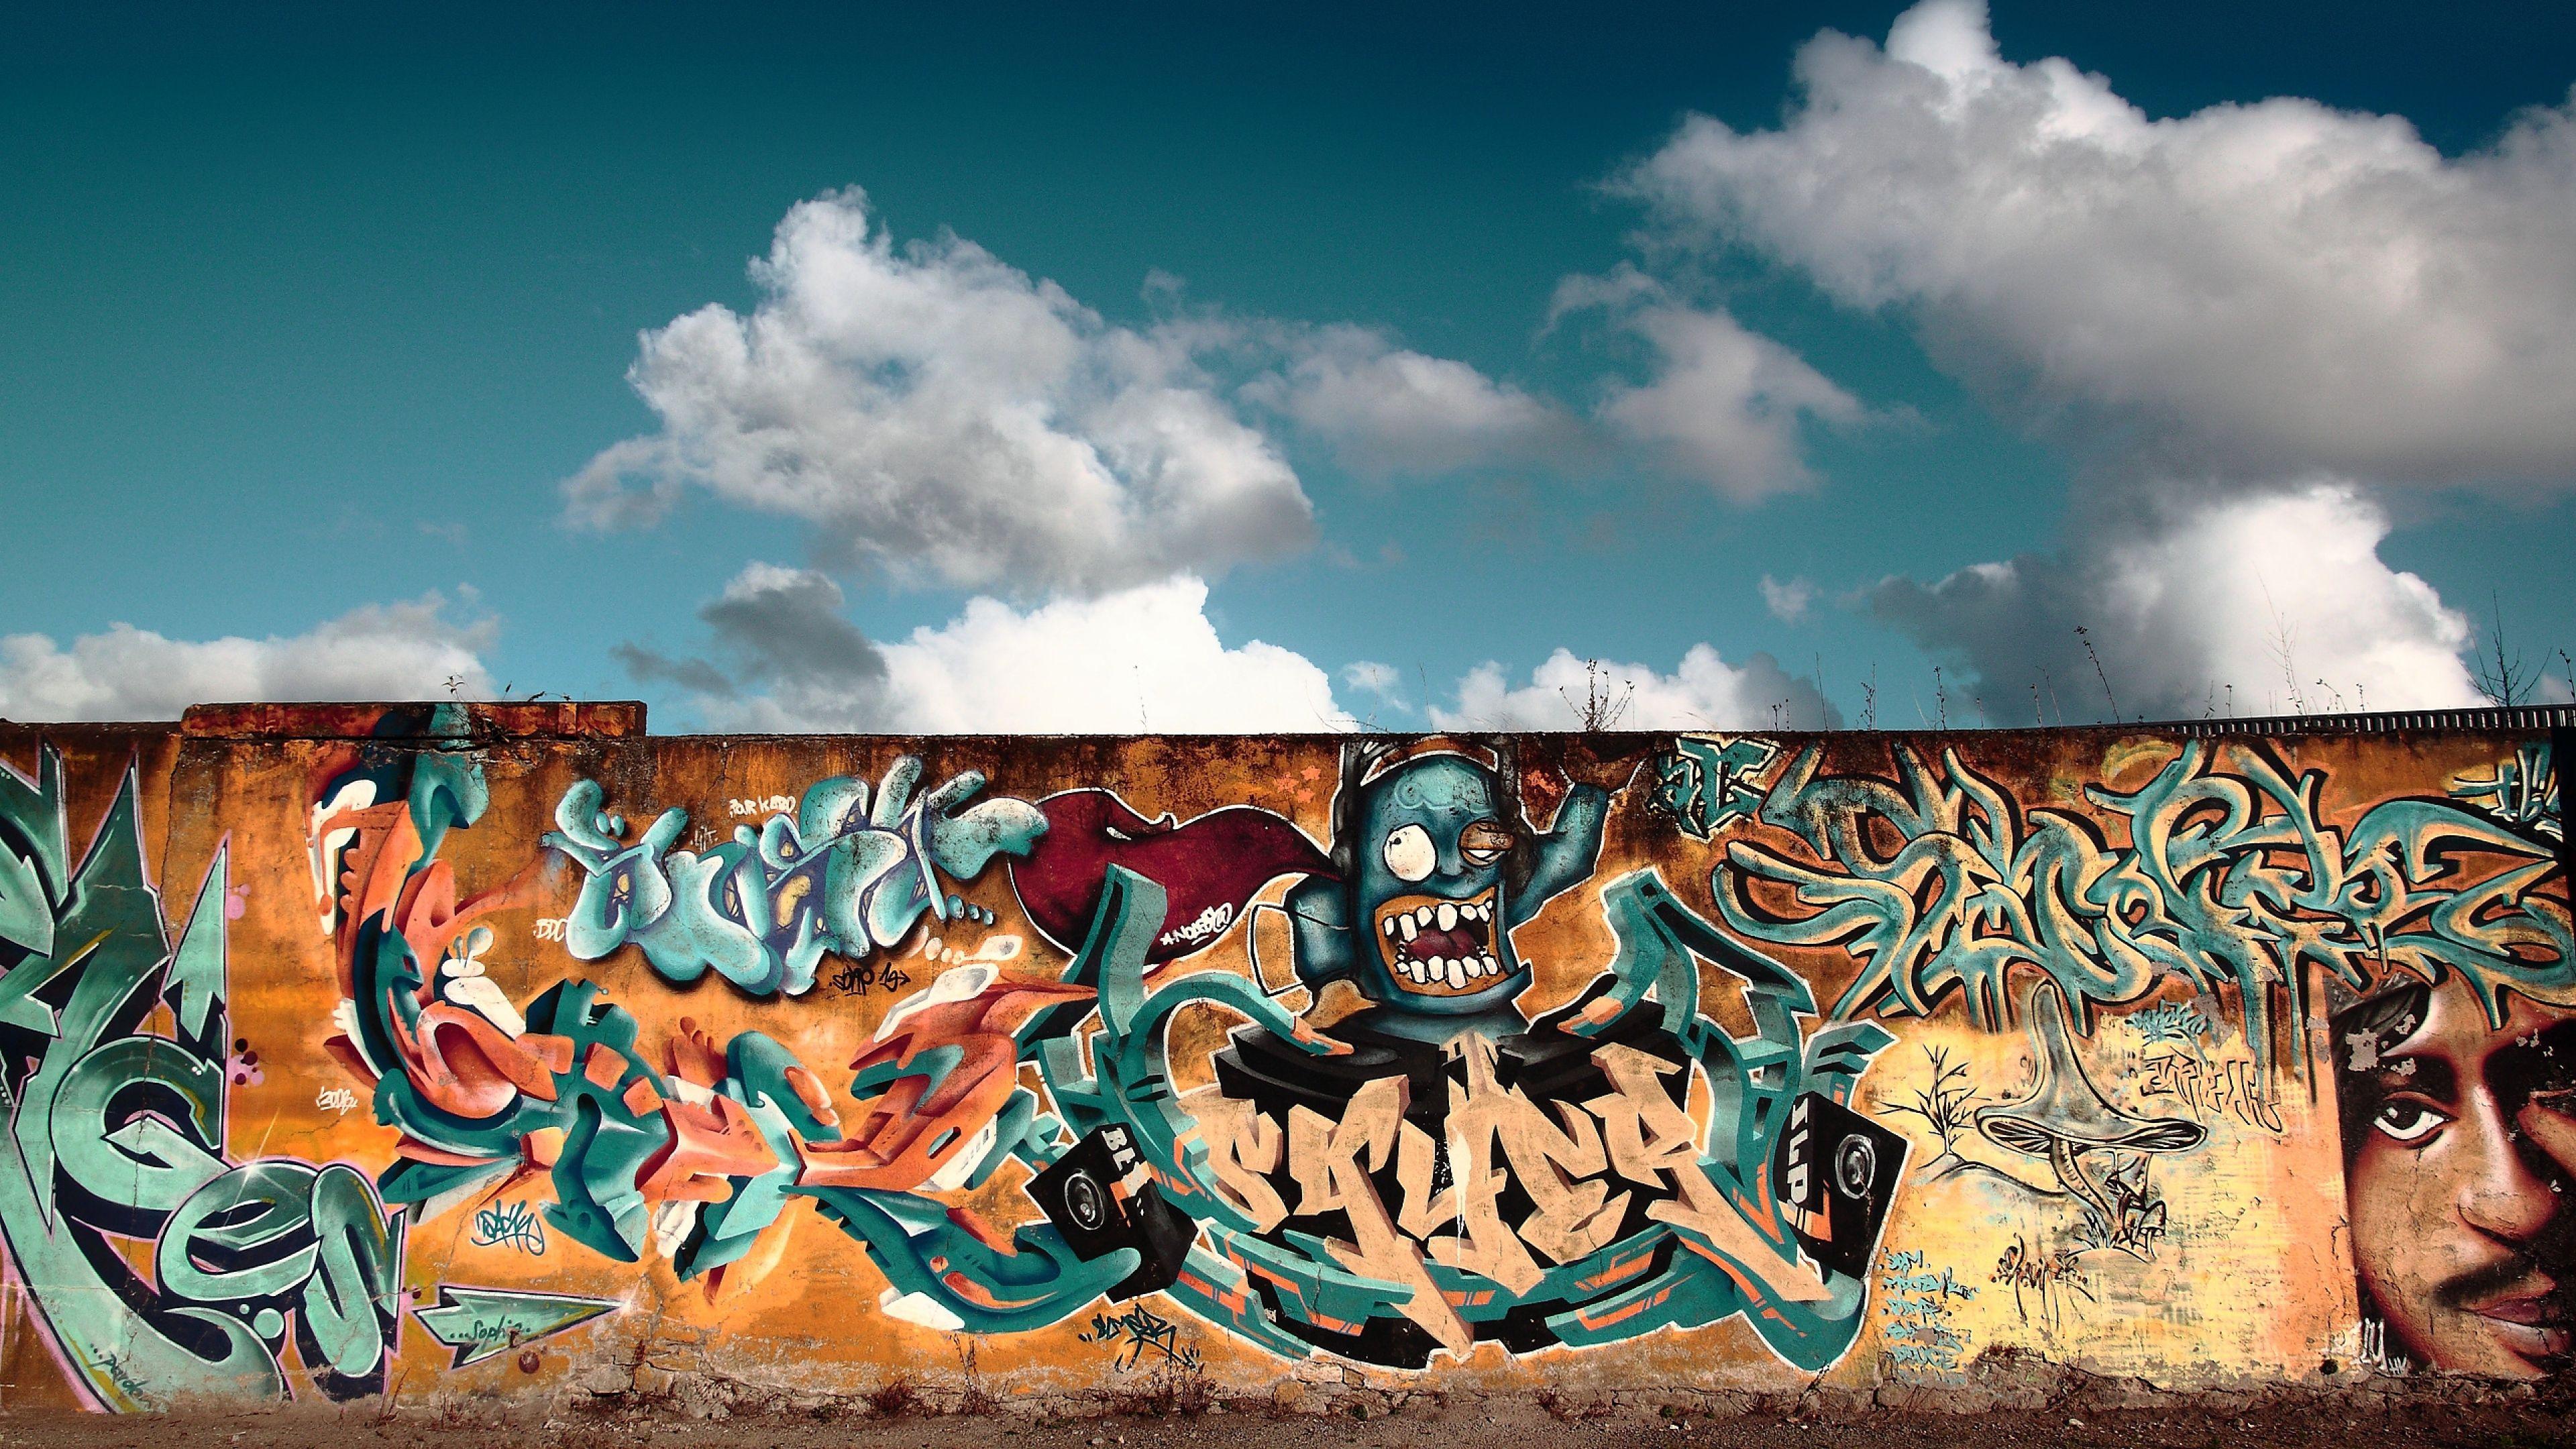 Graffiti wall pictures - Graffiti Wallpaper City Colorful Full Hd